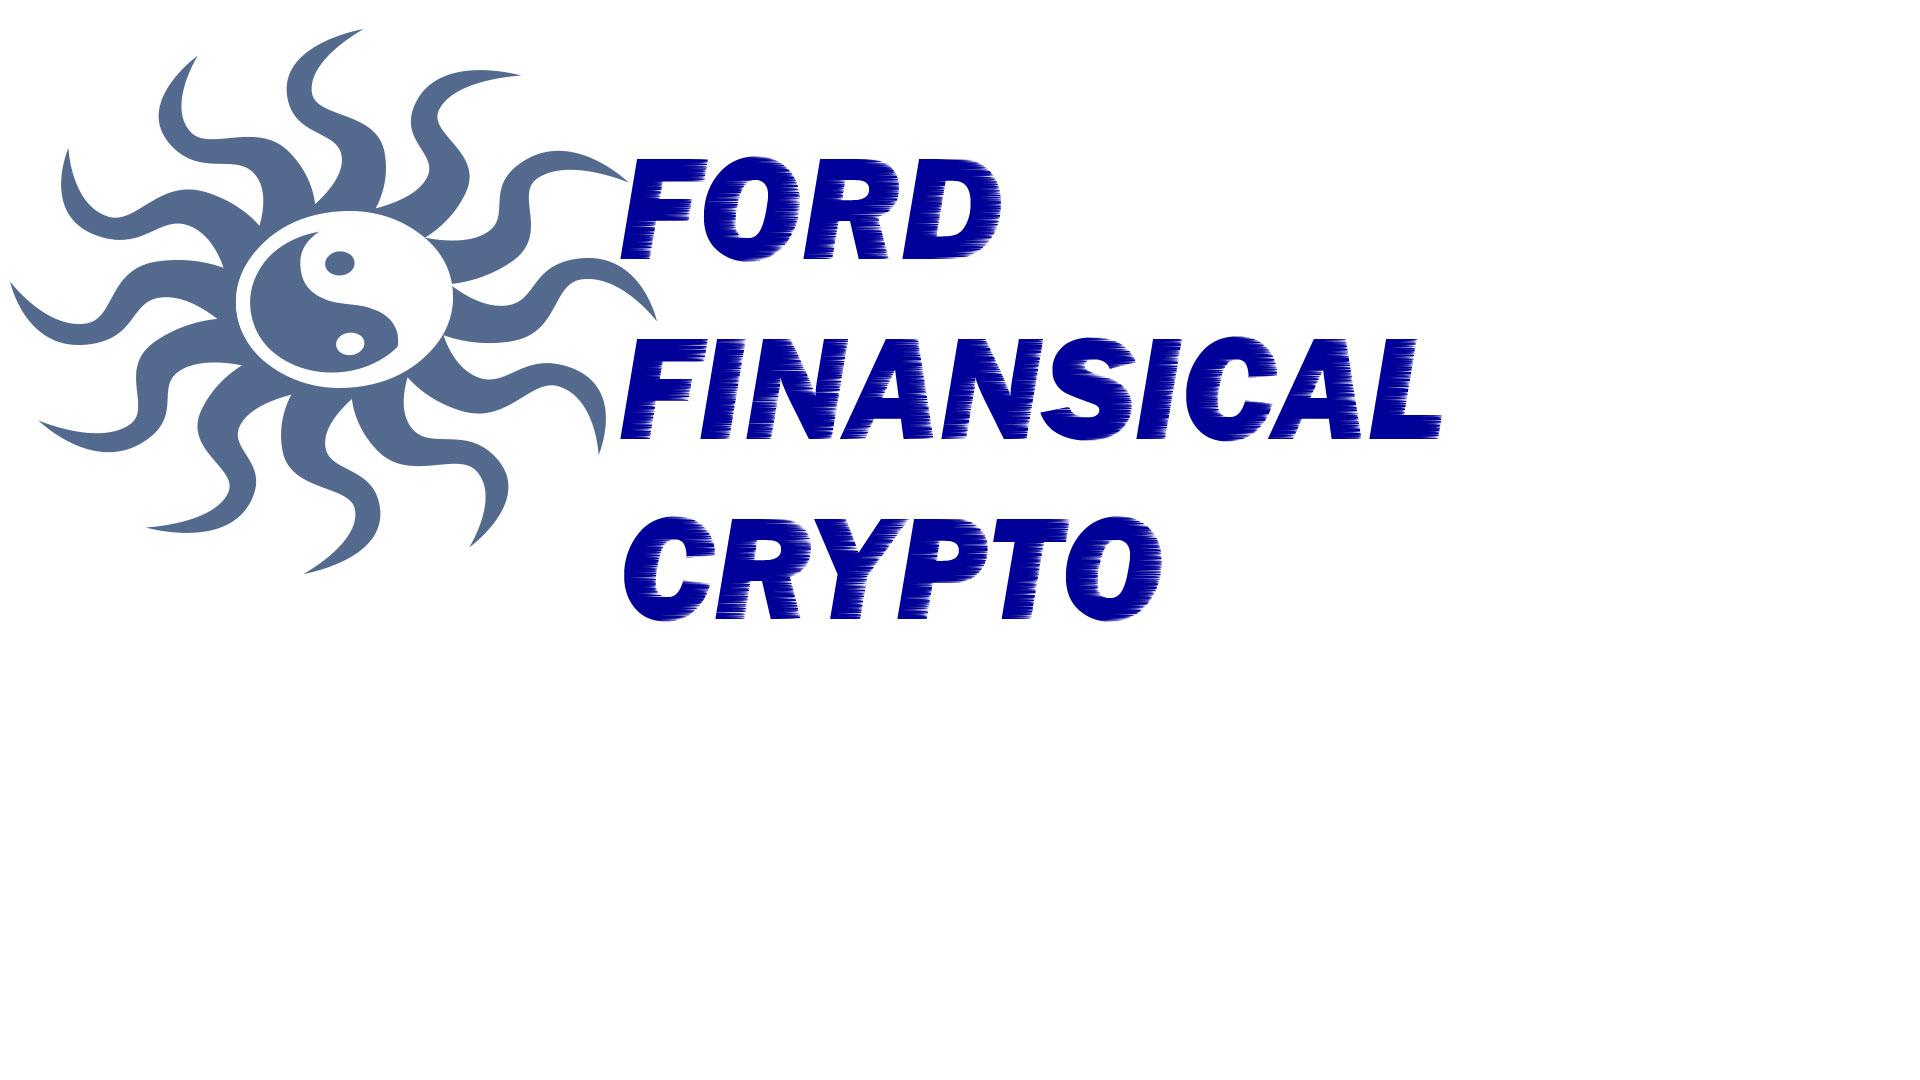 Разработка логотипа финансовой компании фото f_2425a8d12812dbe9.jpg